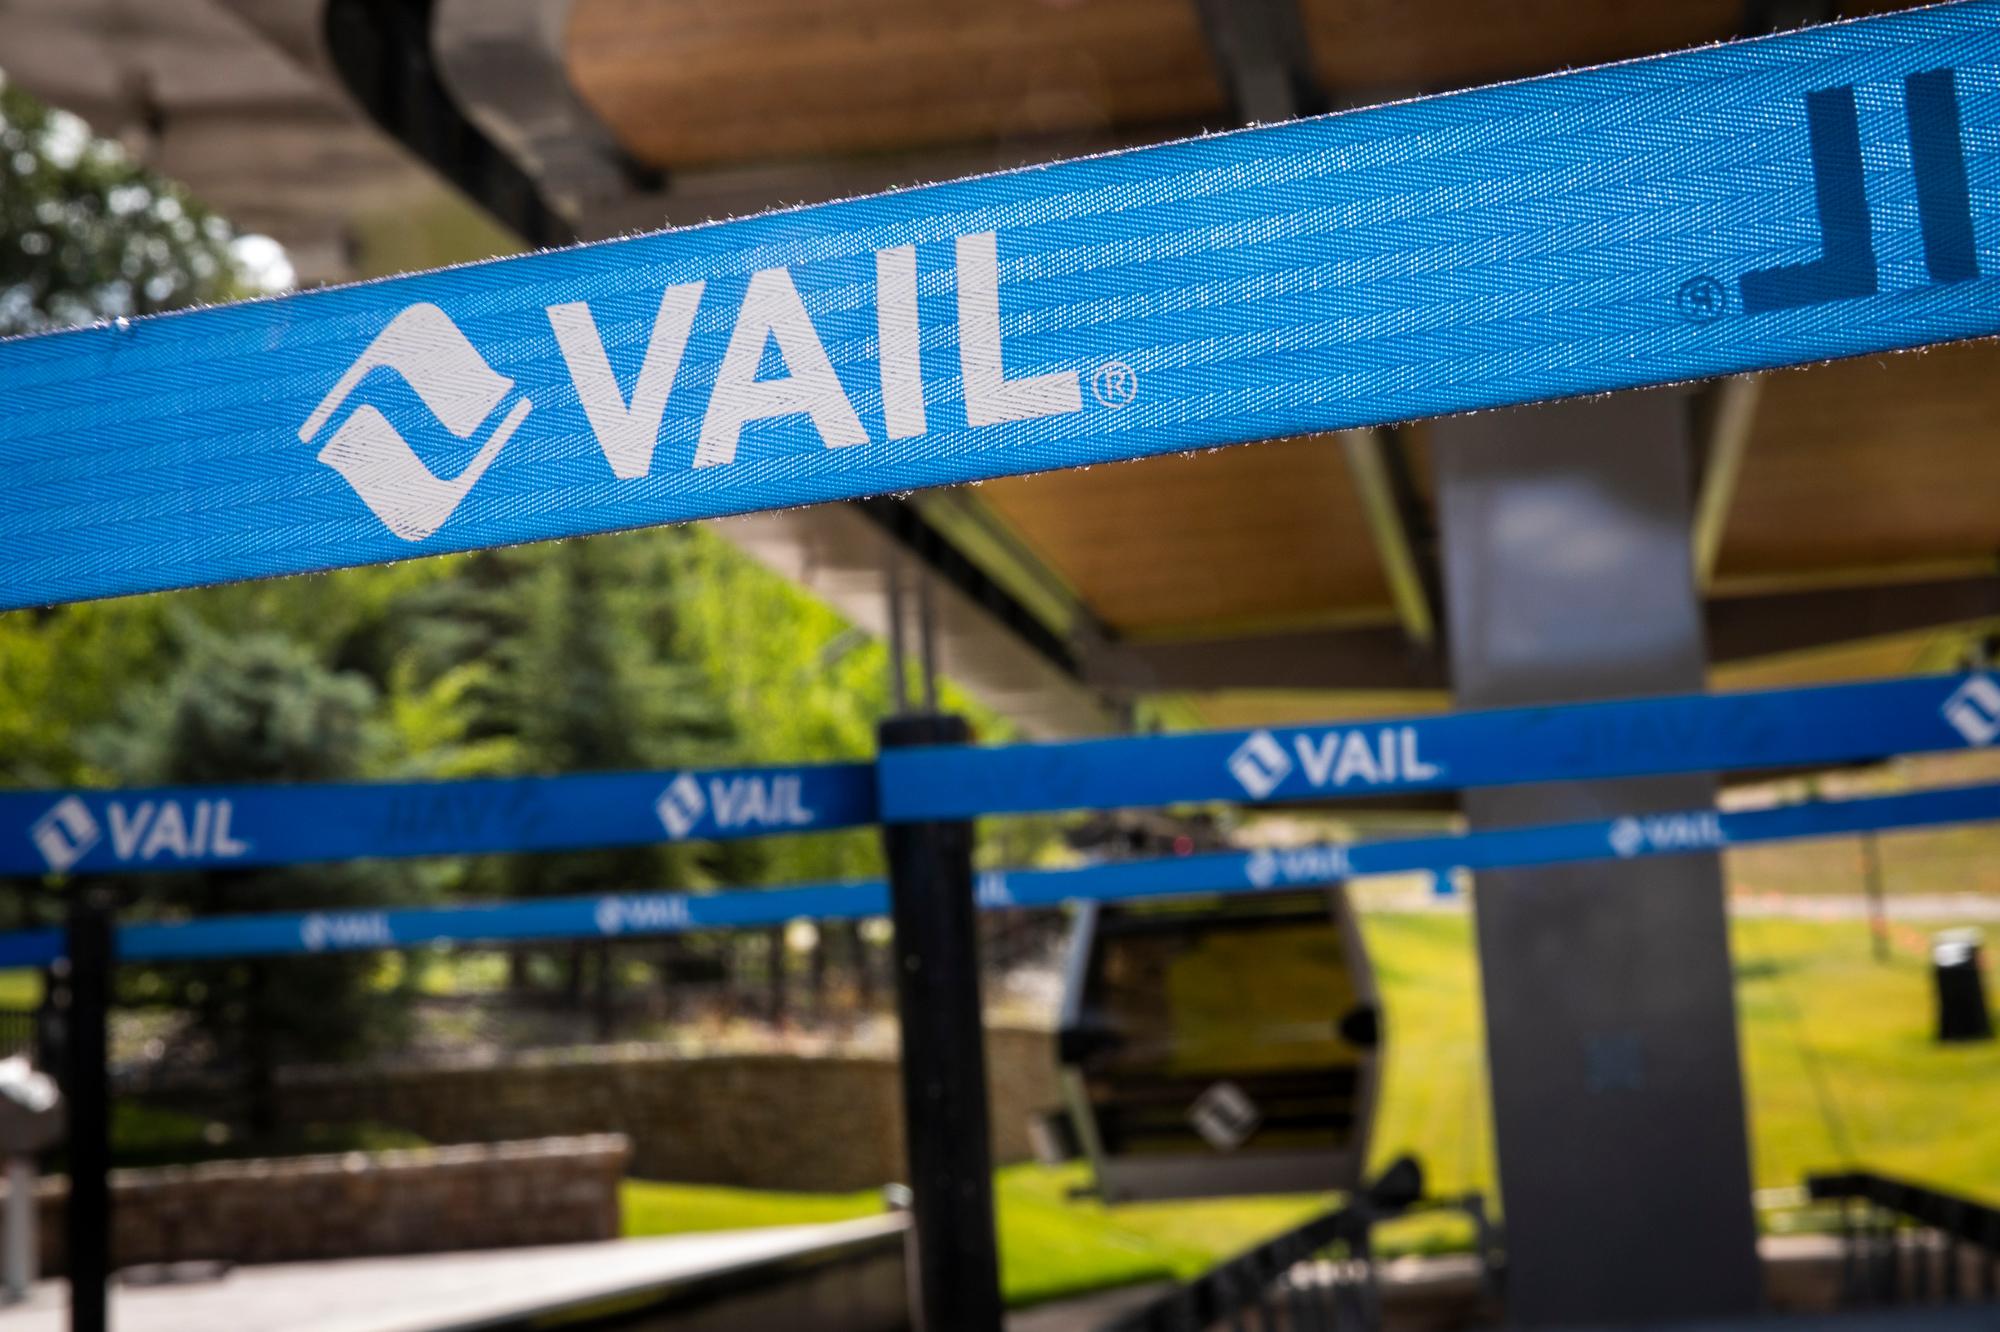 VAIL VILLAGE SUMMER COVID CORONAVIRUS PRECAUTIONS